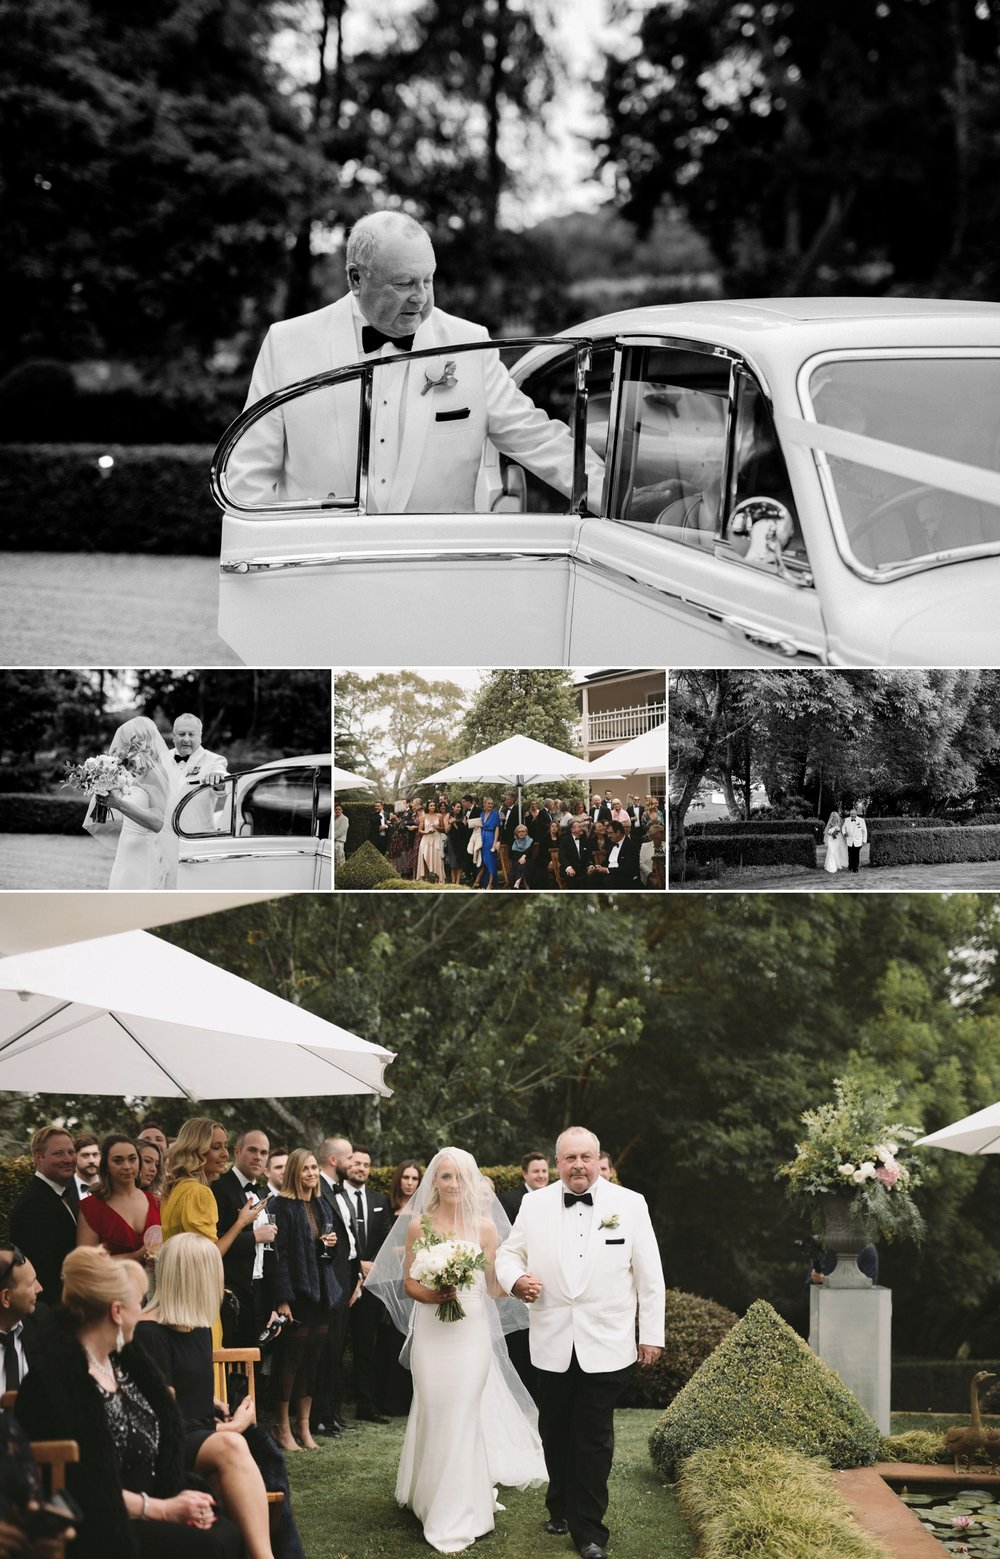 Rebecca & Daniel - Adelaide Hills Private Property Wedding Photographer - Fine Art Wedding Photographer Australia - Katherine Schultz - www.katherineschultzphotography.com_0033.jpg